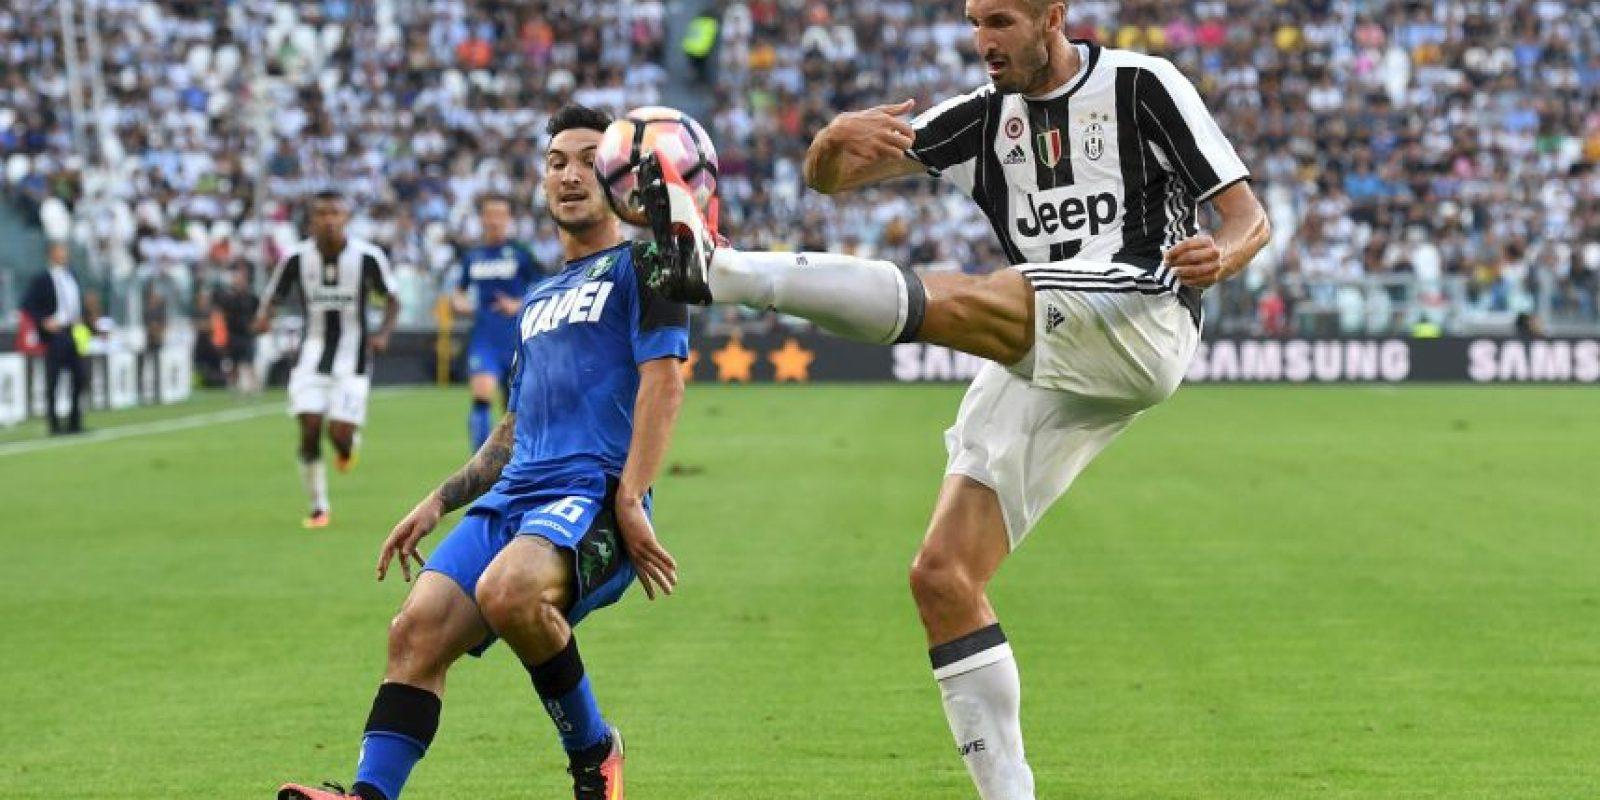 Giorgio Chiellini (Juventus) Foto:Getty Images